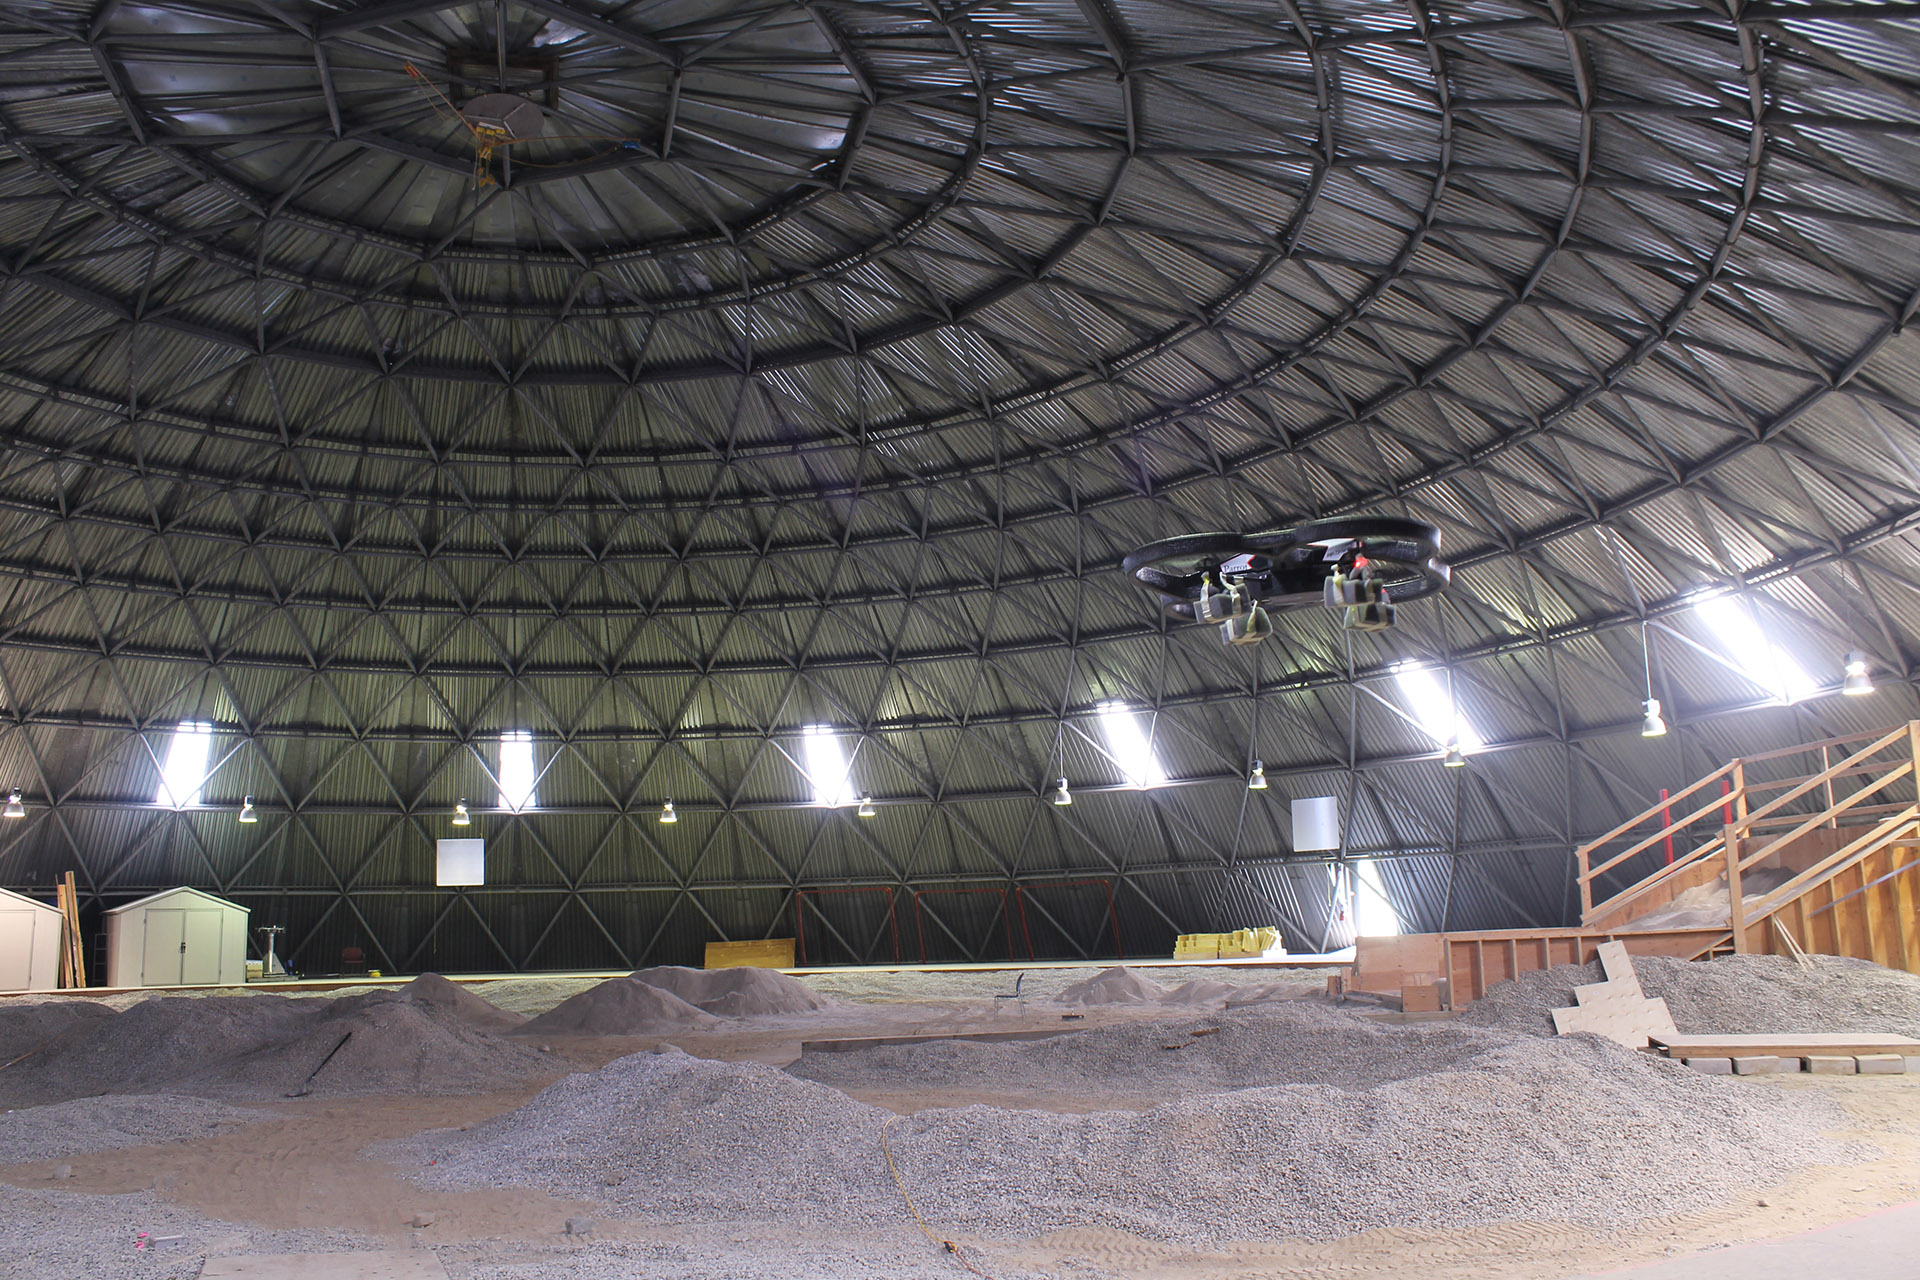 Quadrocopter test in the UTIAS Mars Dome.